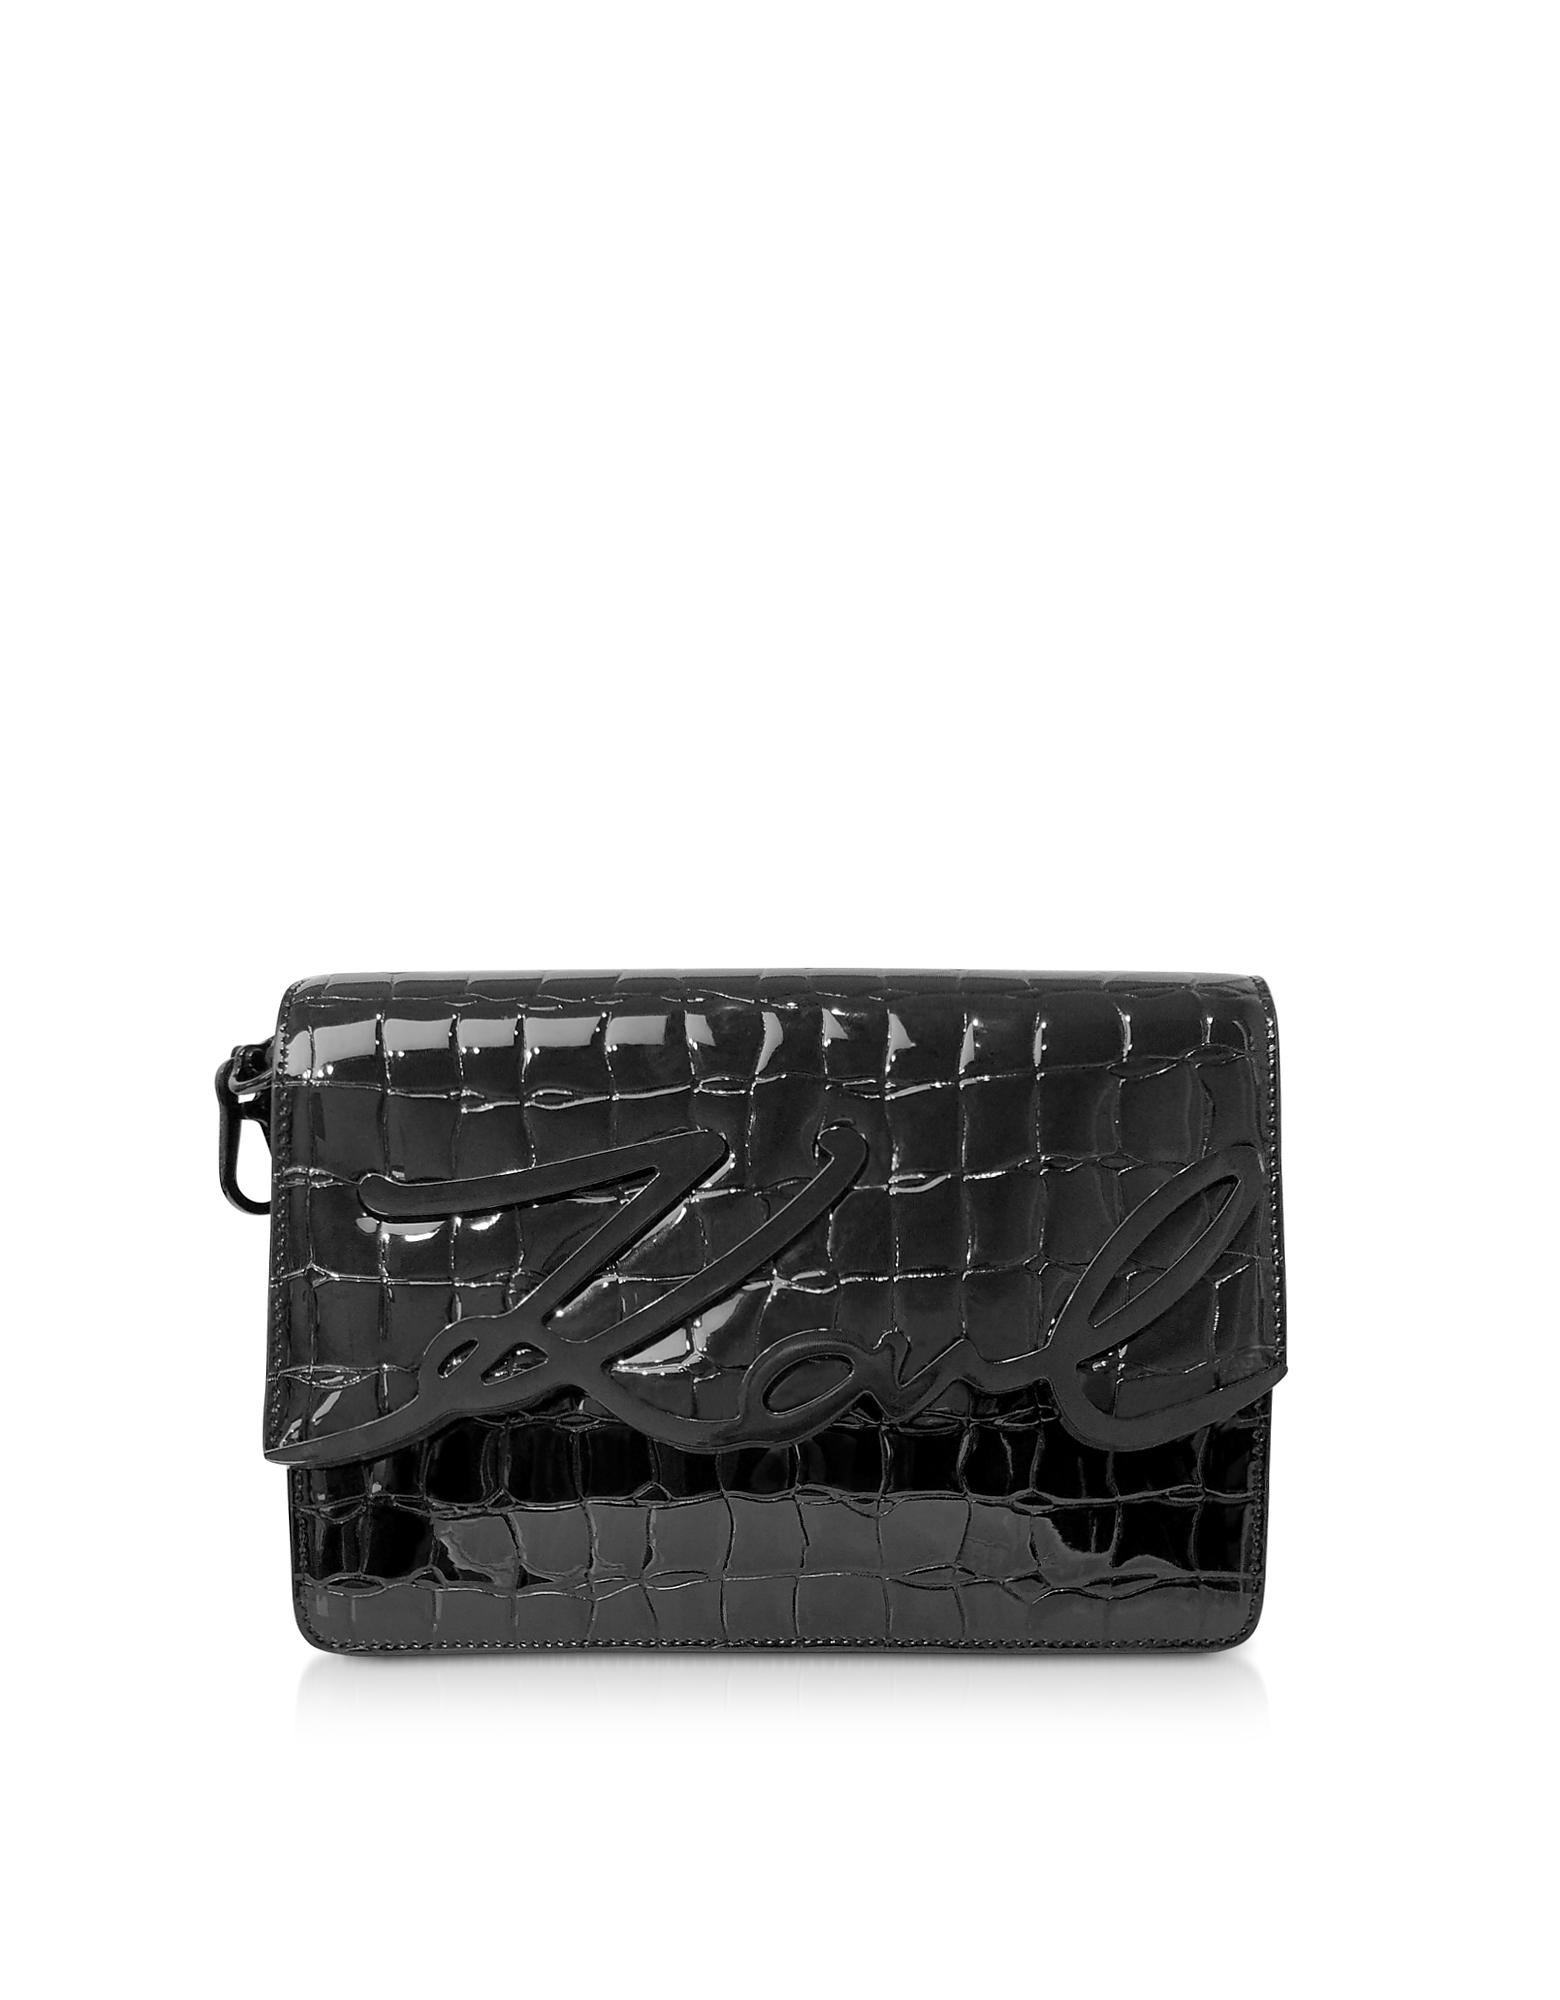 Karl Lagerfeld  Handbags K/Signature Black Croco Leather Shoulder Bag w/ Signature